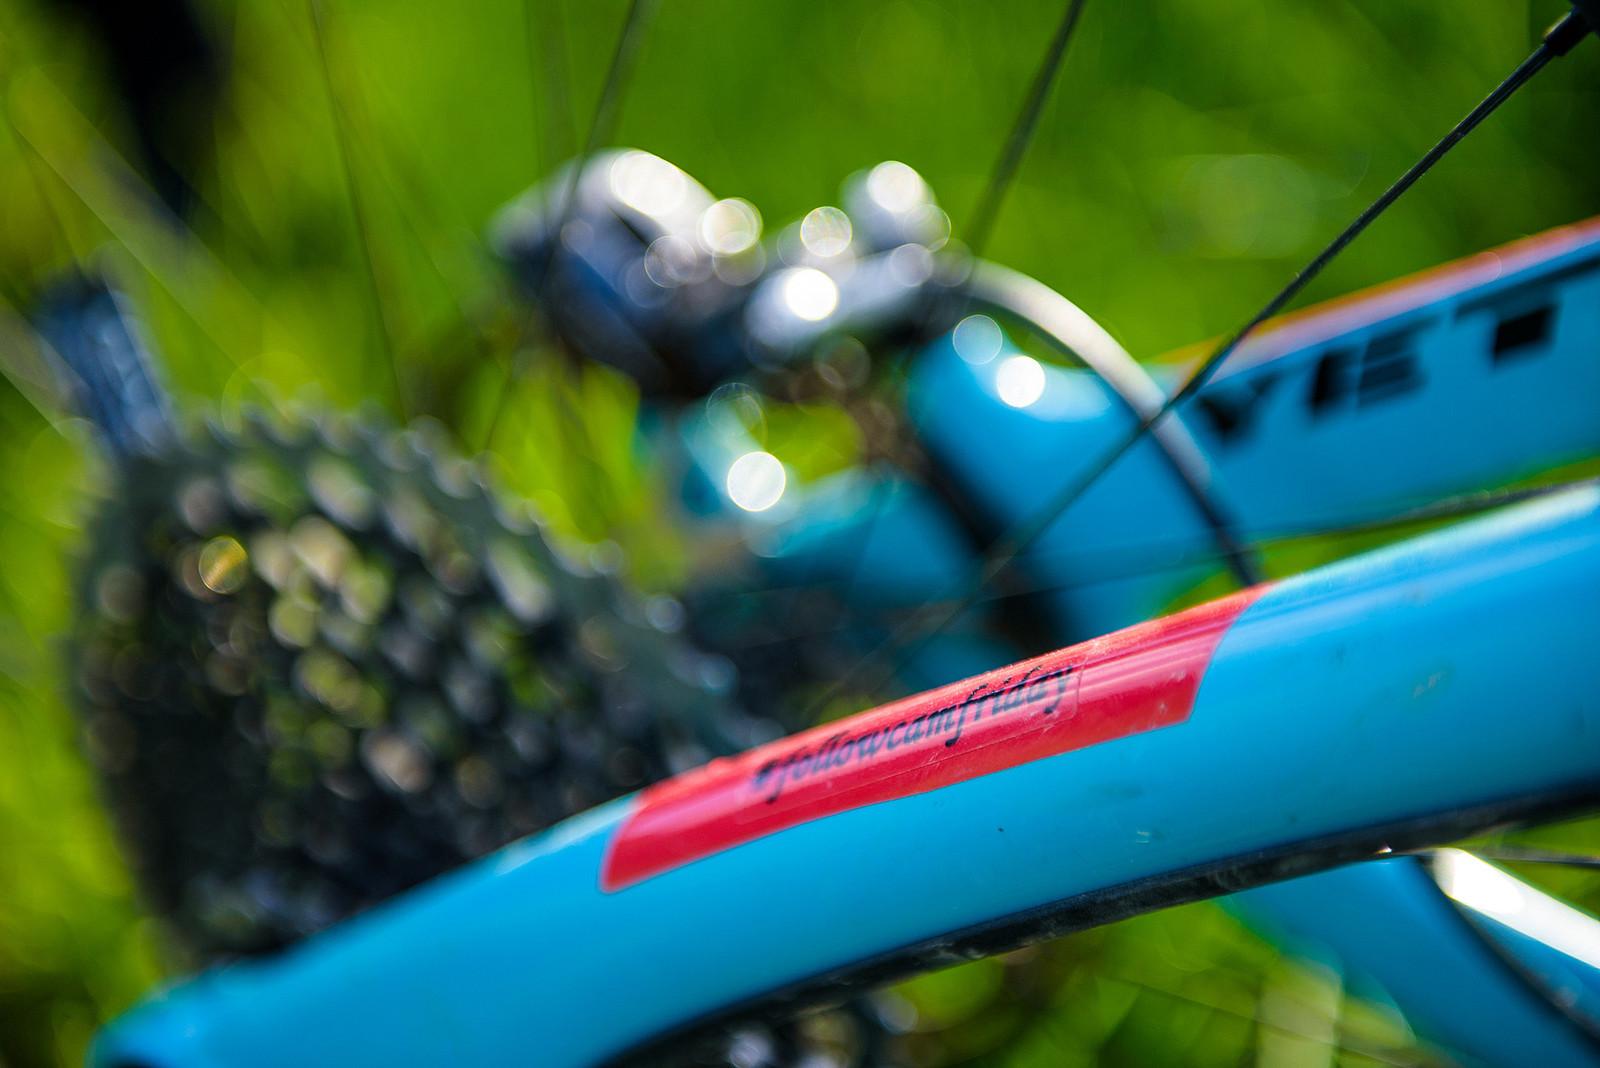 Custom Red Swatches to Match the New Lyrik - Nate Hills' Yeti SB5 with 2019 RockShox Lyrik - Mountain Biking Pictures - Vital MTB